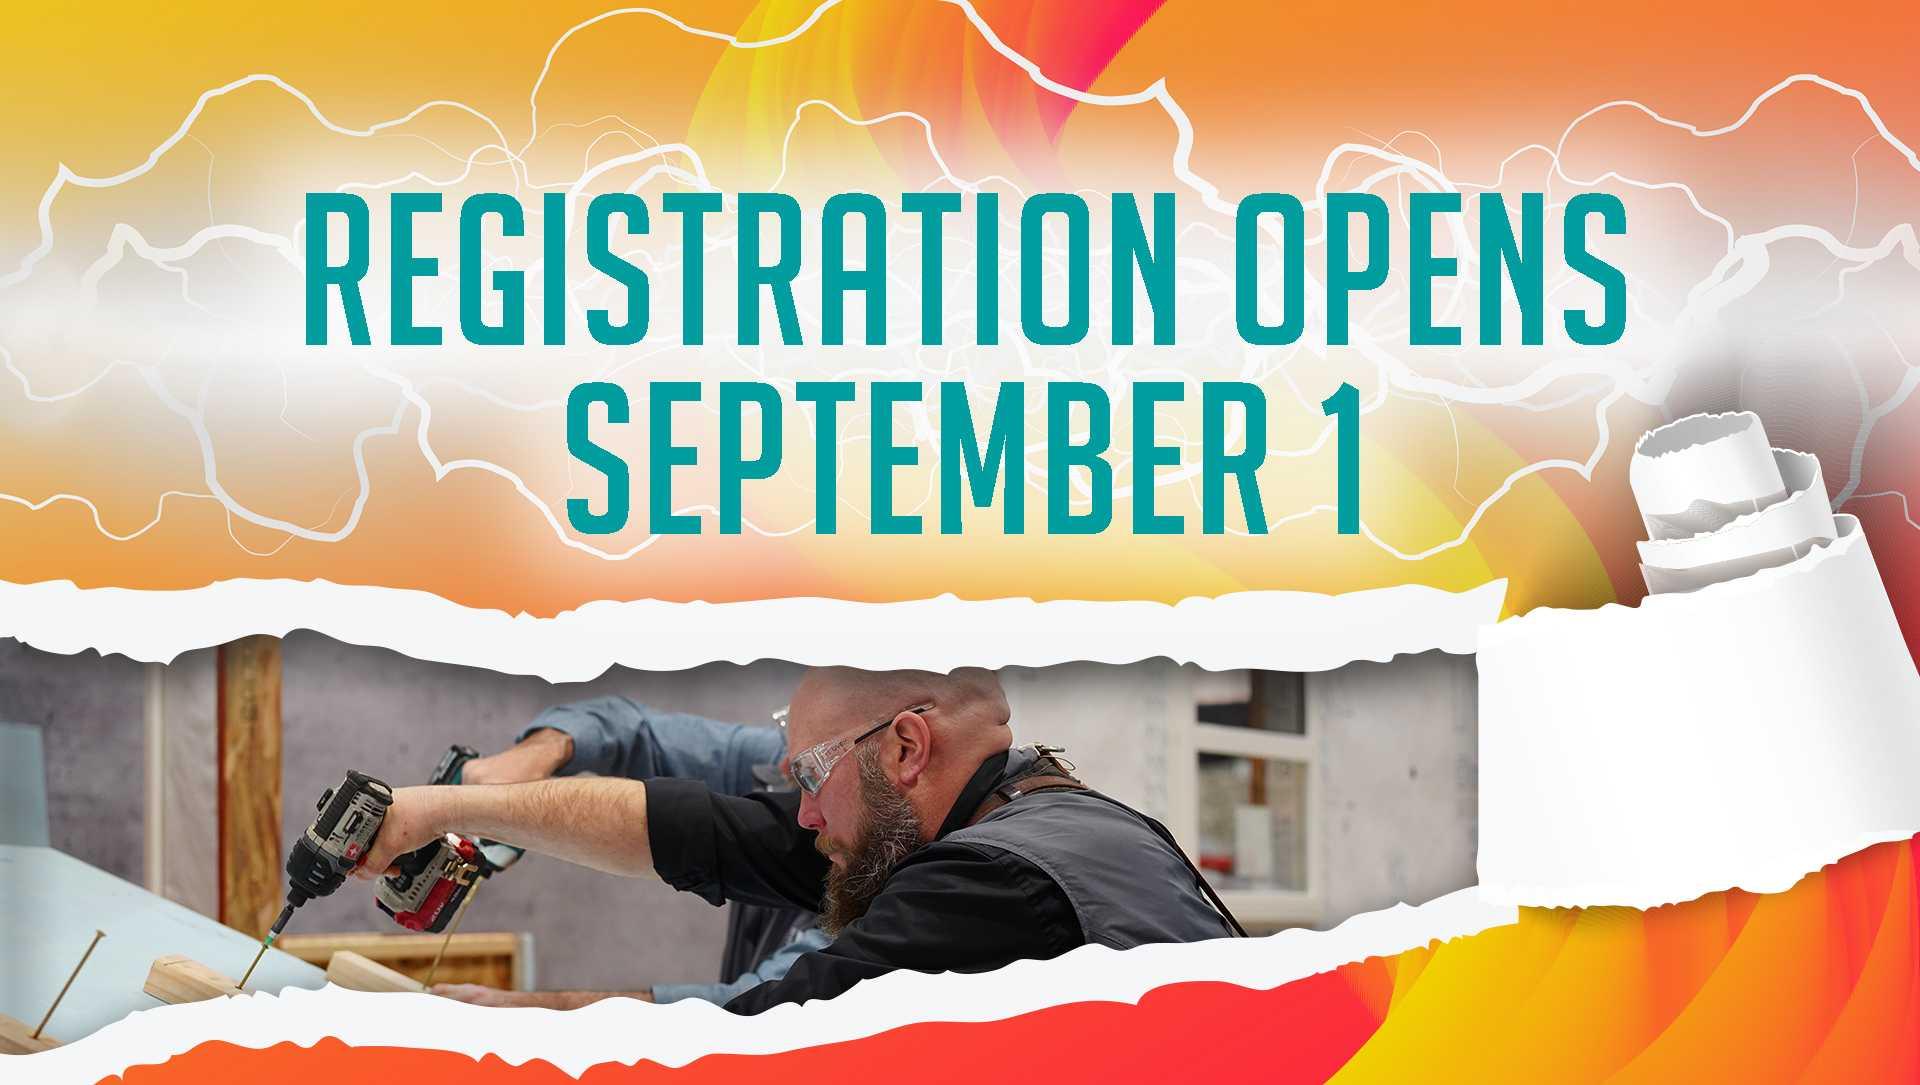 Registration Opens September 1